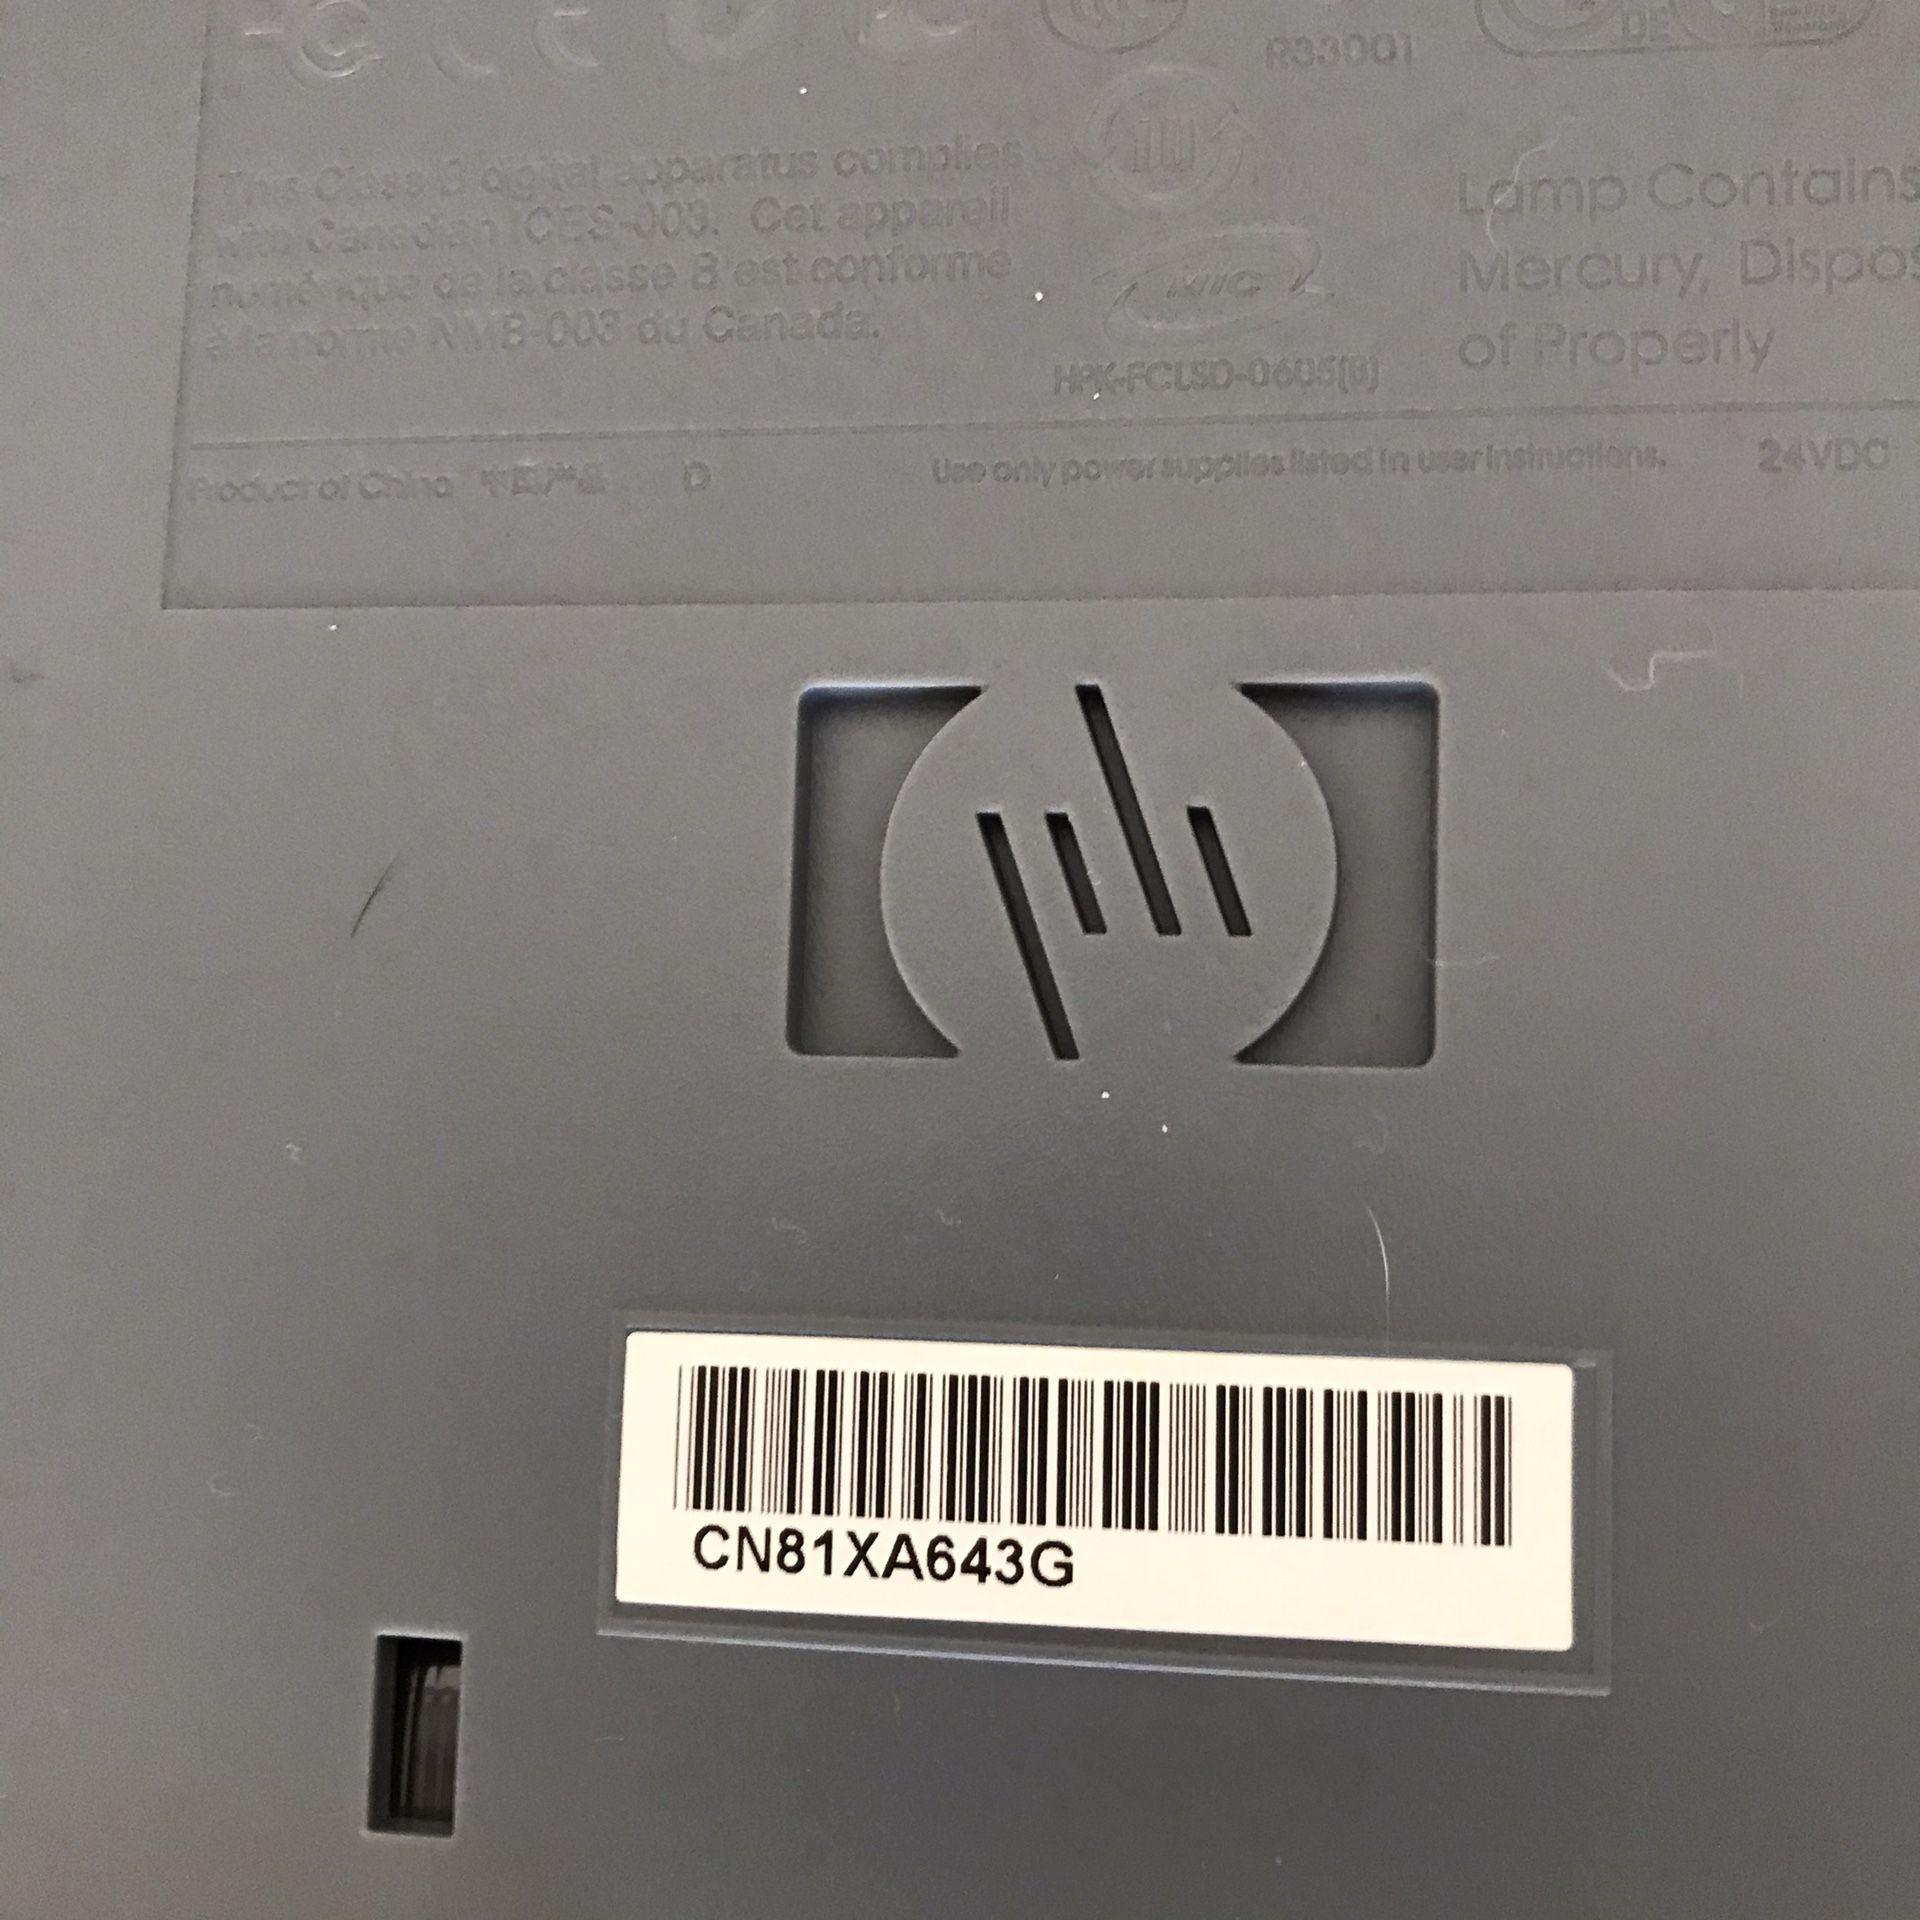 HP Hewlett Packard Scanjet Like New Electronics MULTIPLE PHOTOS